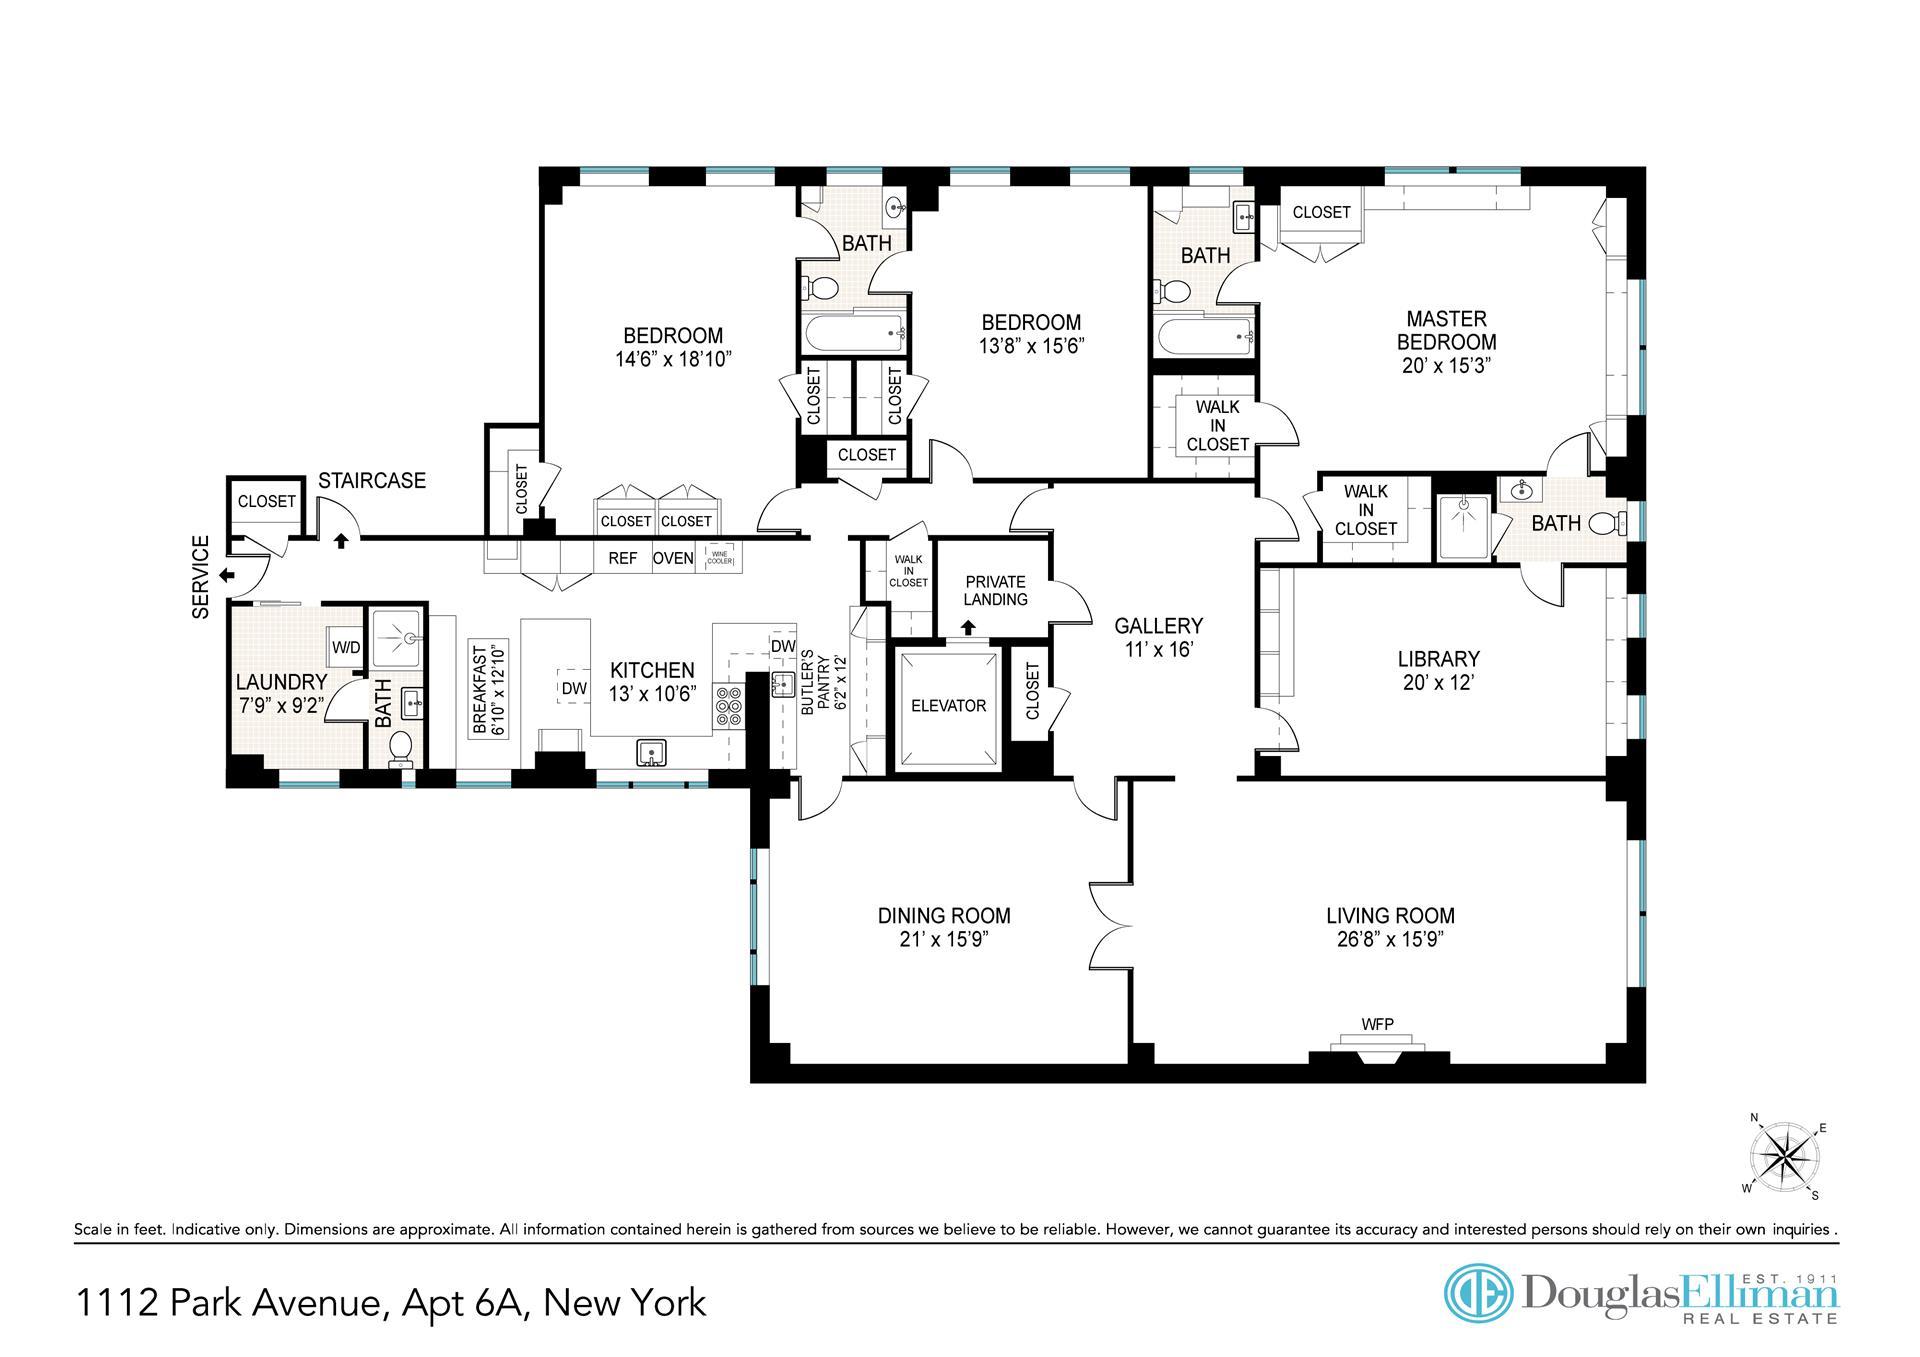 Floor plan of Eleven-Twelve Corporation, 1112 Park Avenue, 6A - Carnegie Hill, New York